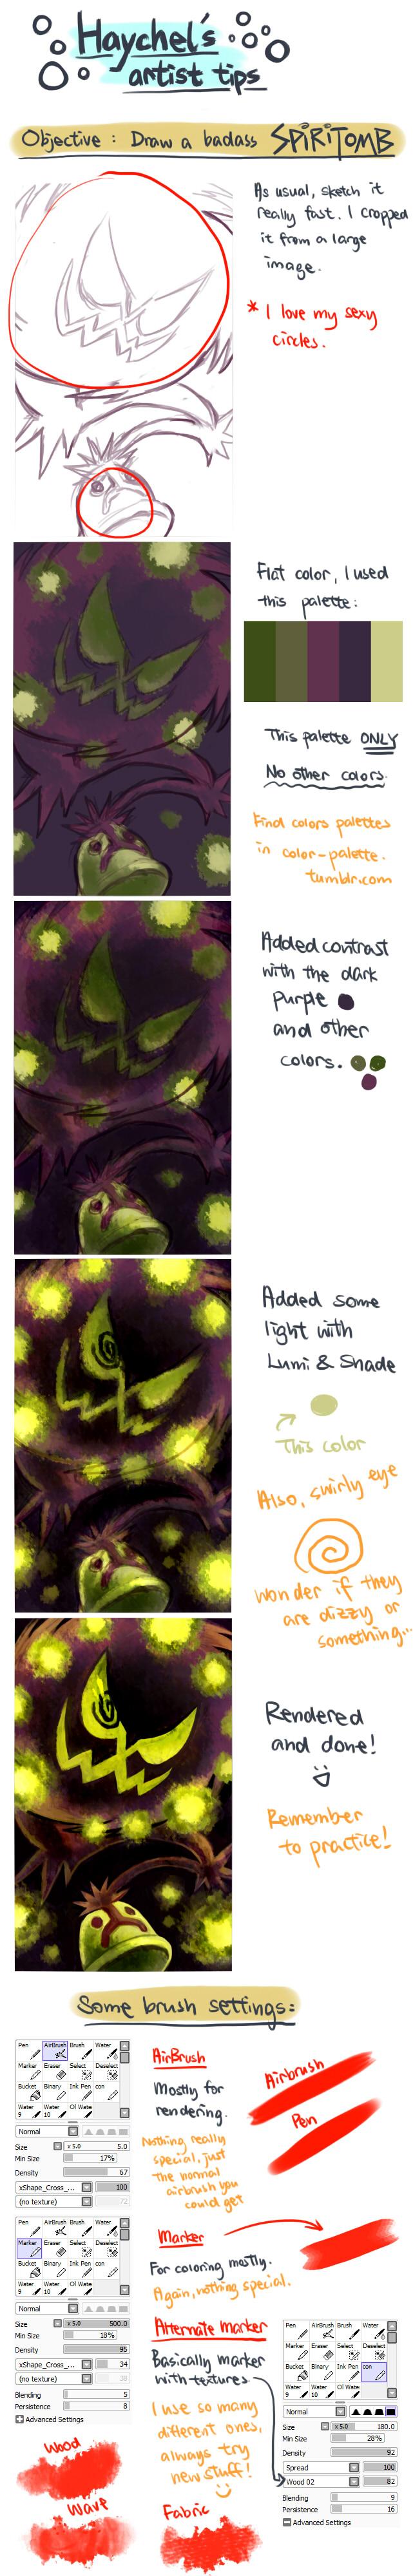 HL's Artist Tips: Spiritomb by Haychel